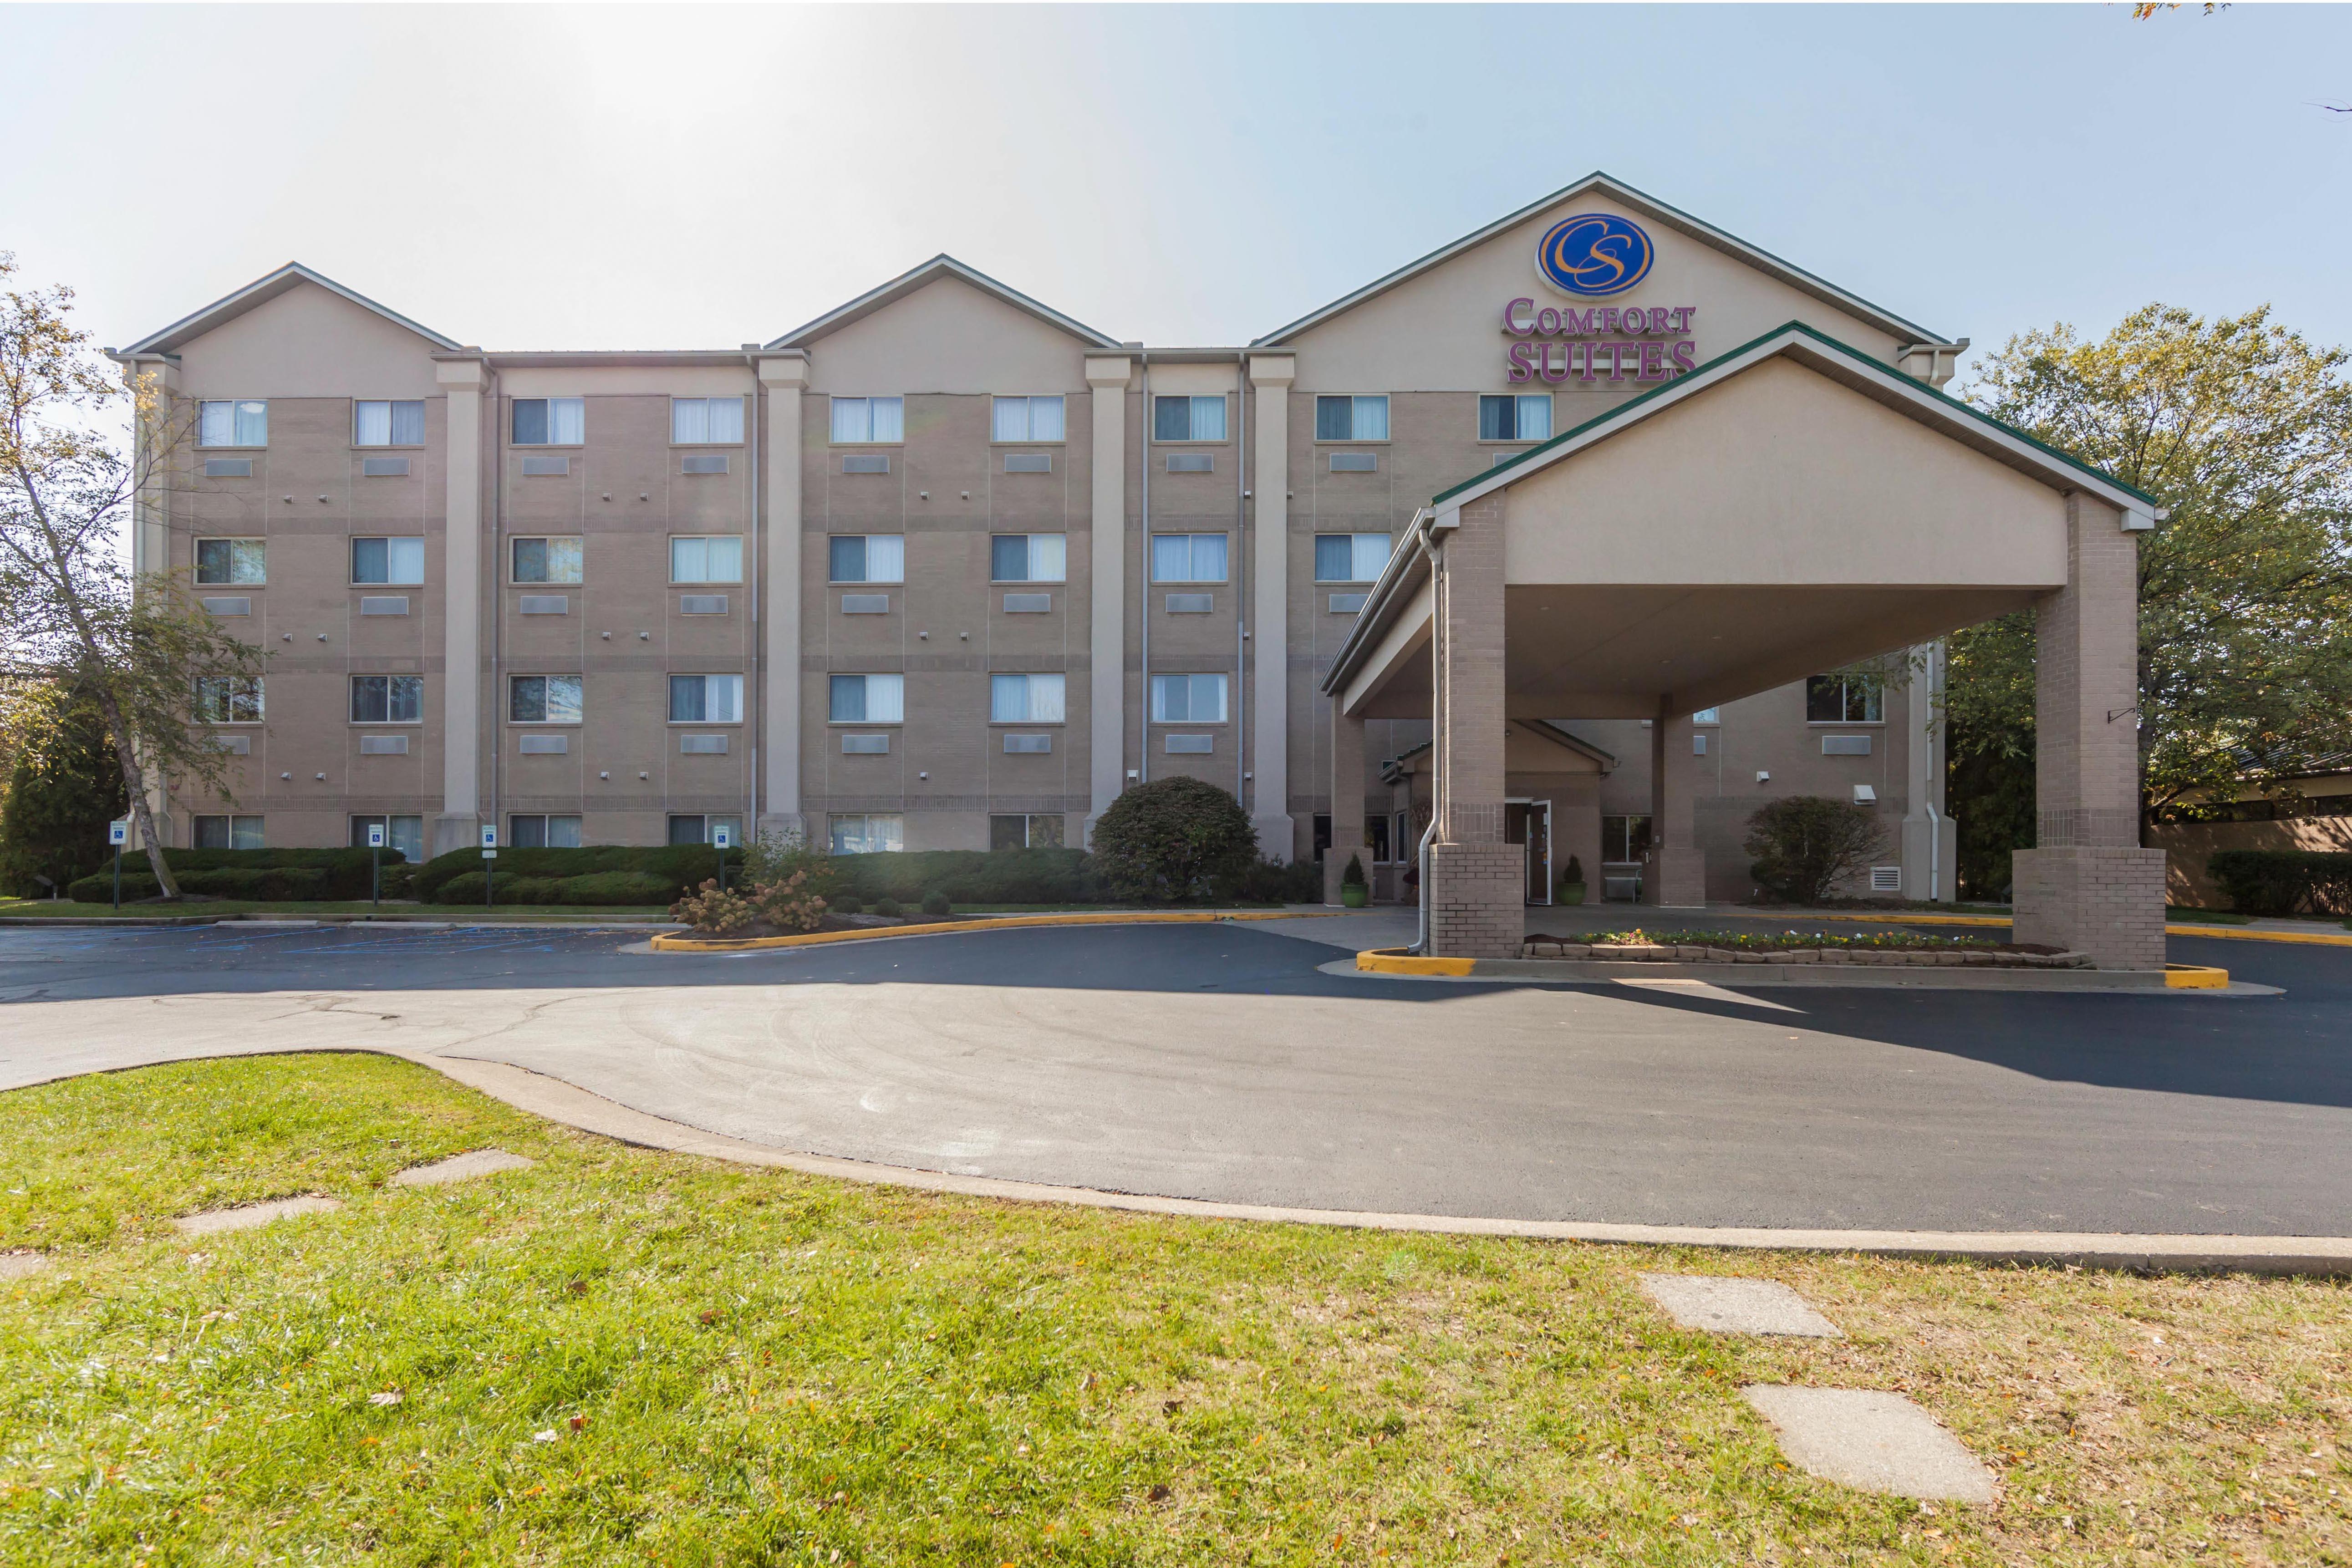 Comfort Suites Lexington Kentucky Ky Localdatabase Com